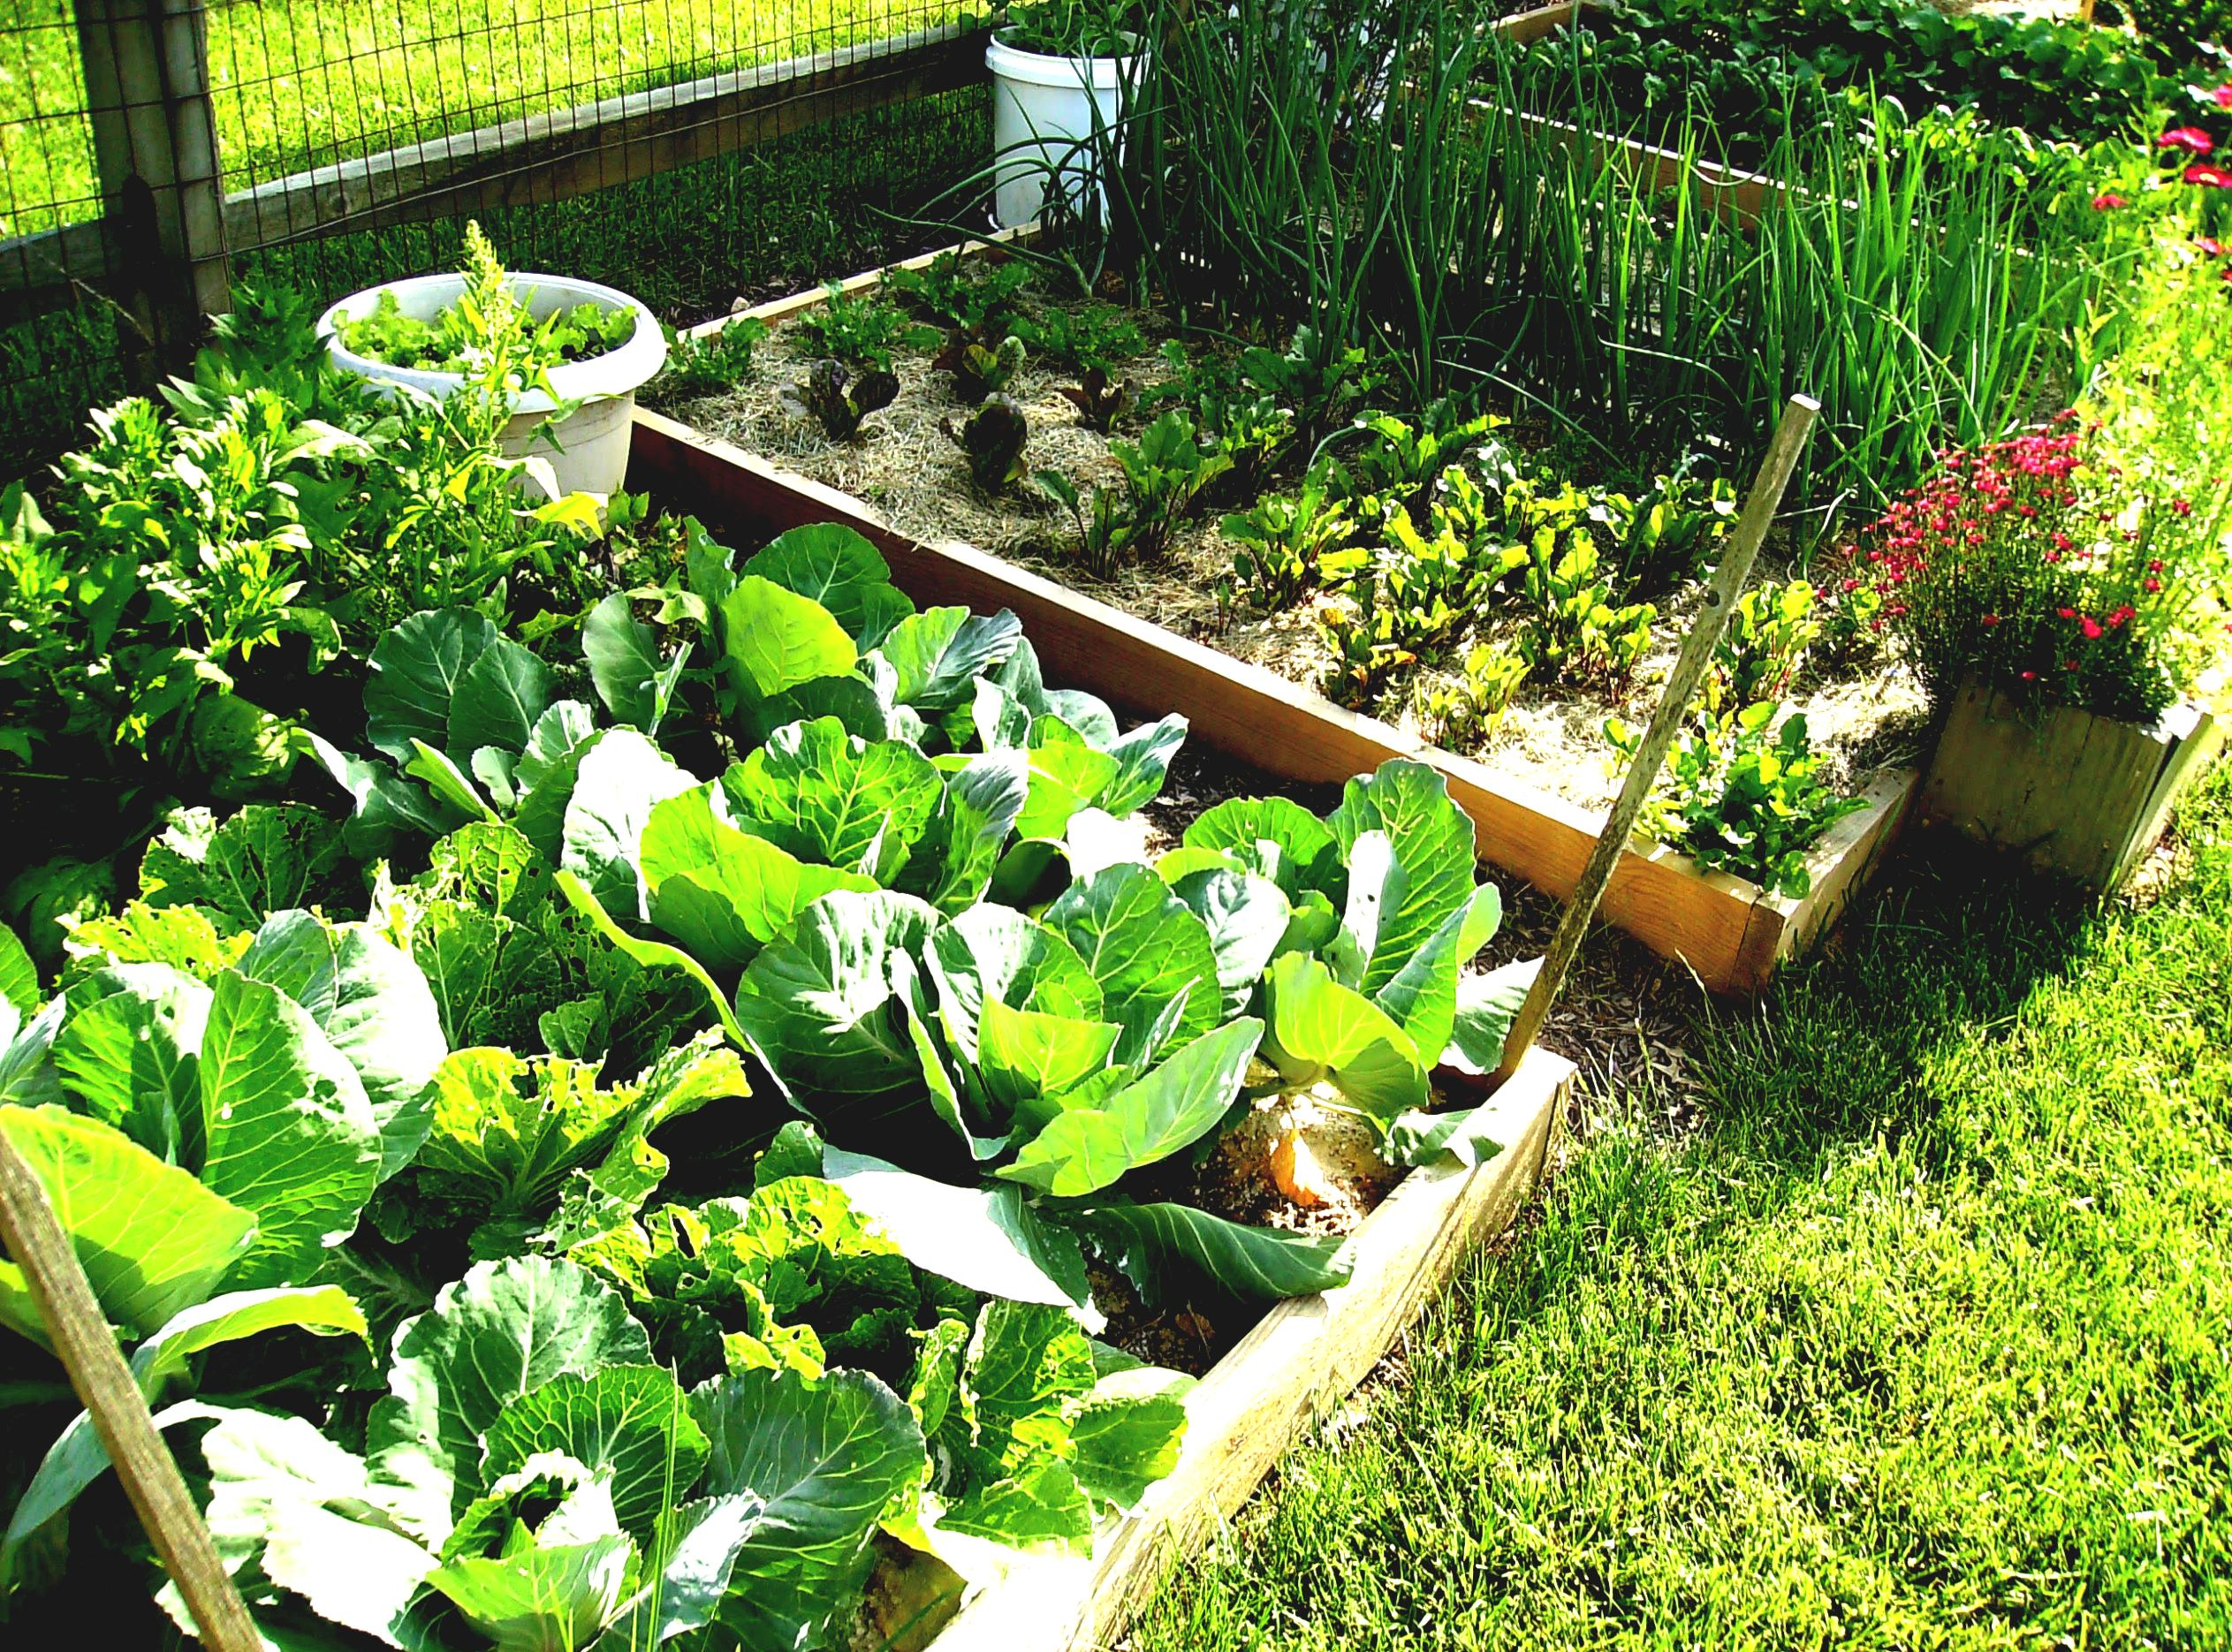 starting an urban vegetable garden photo - 10